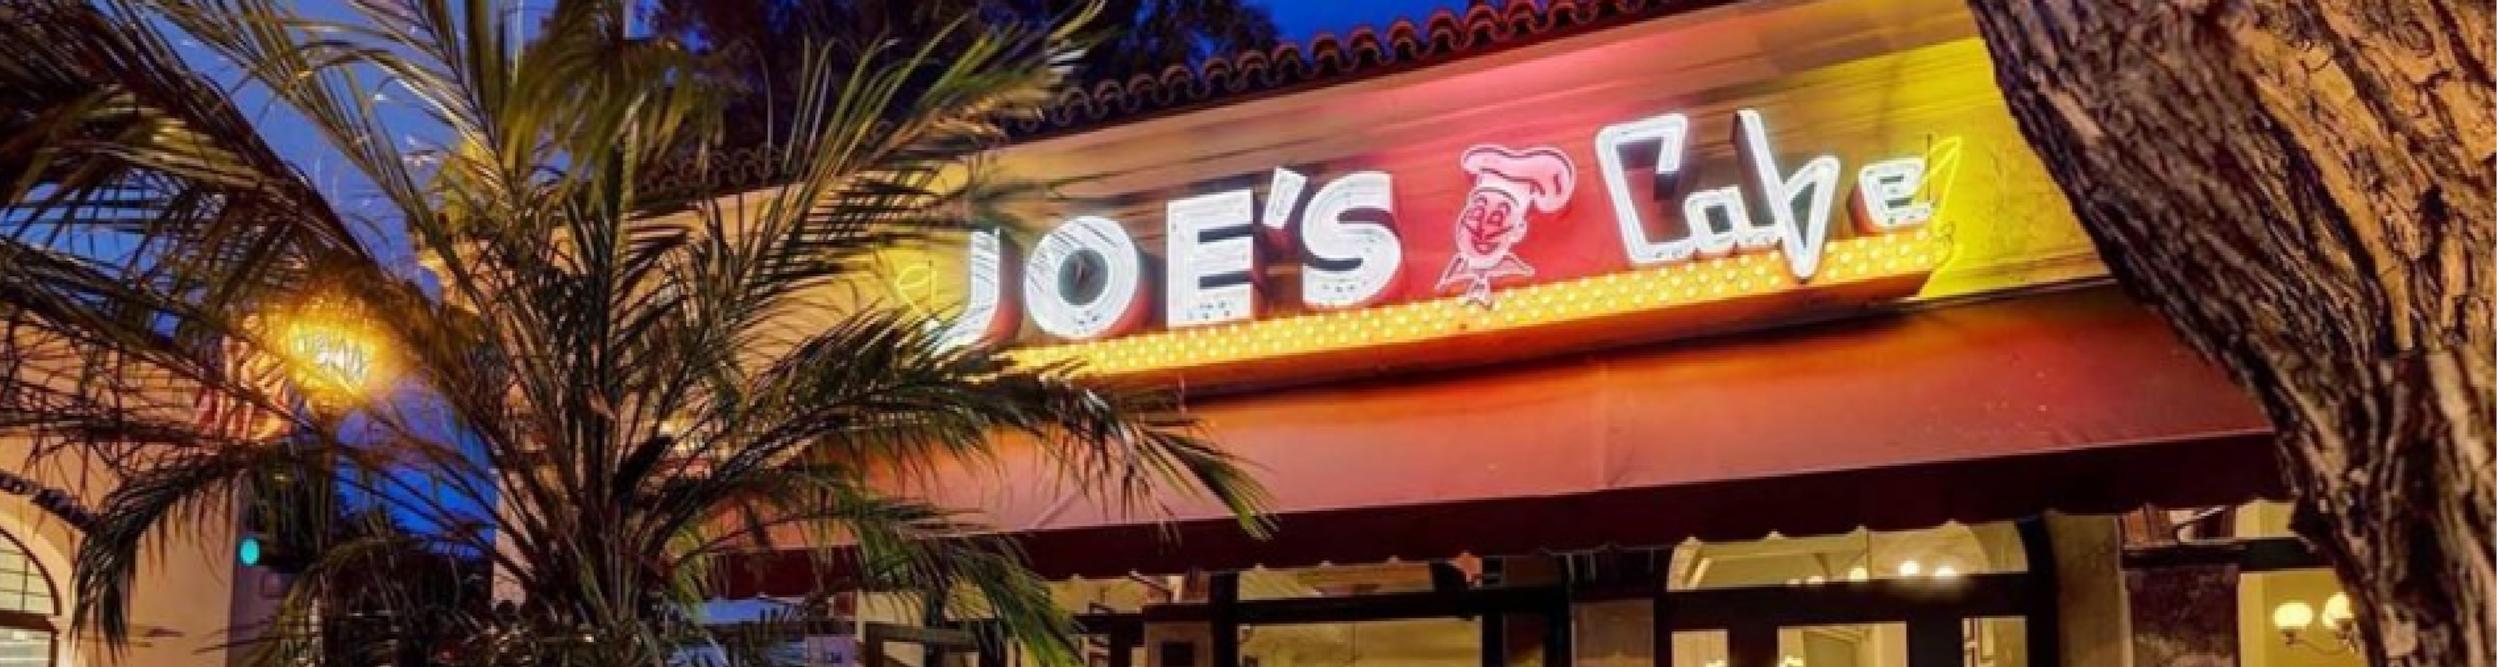 SBRW- Joe's Cafe Main Restaurant Image.png